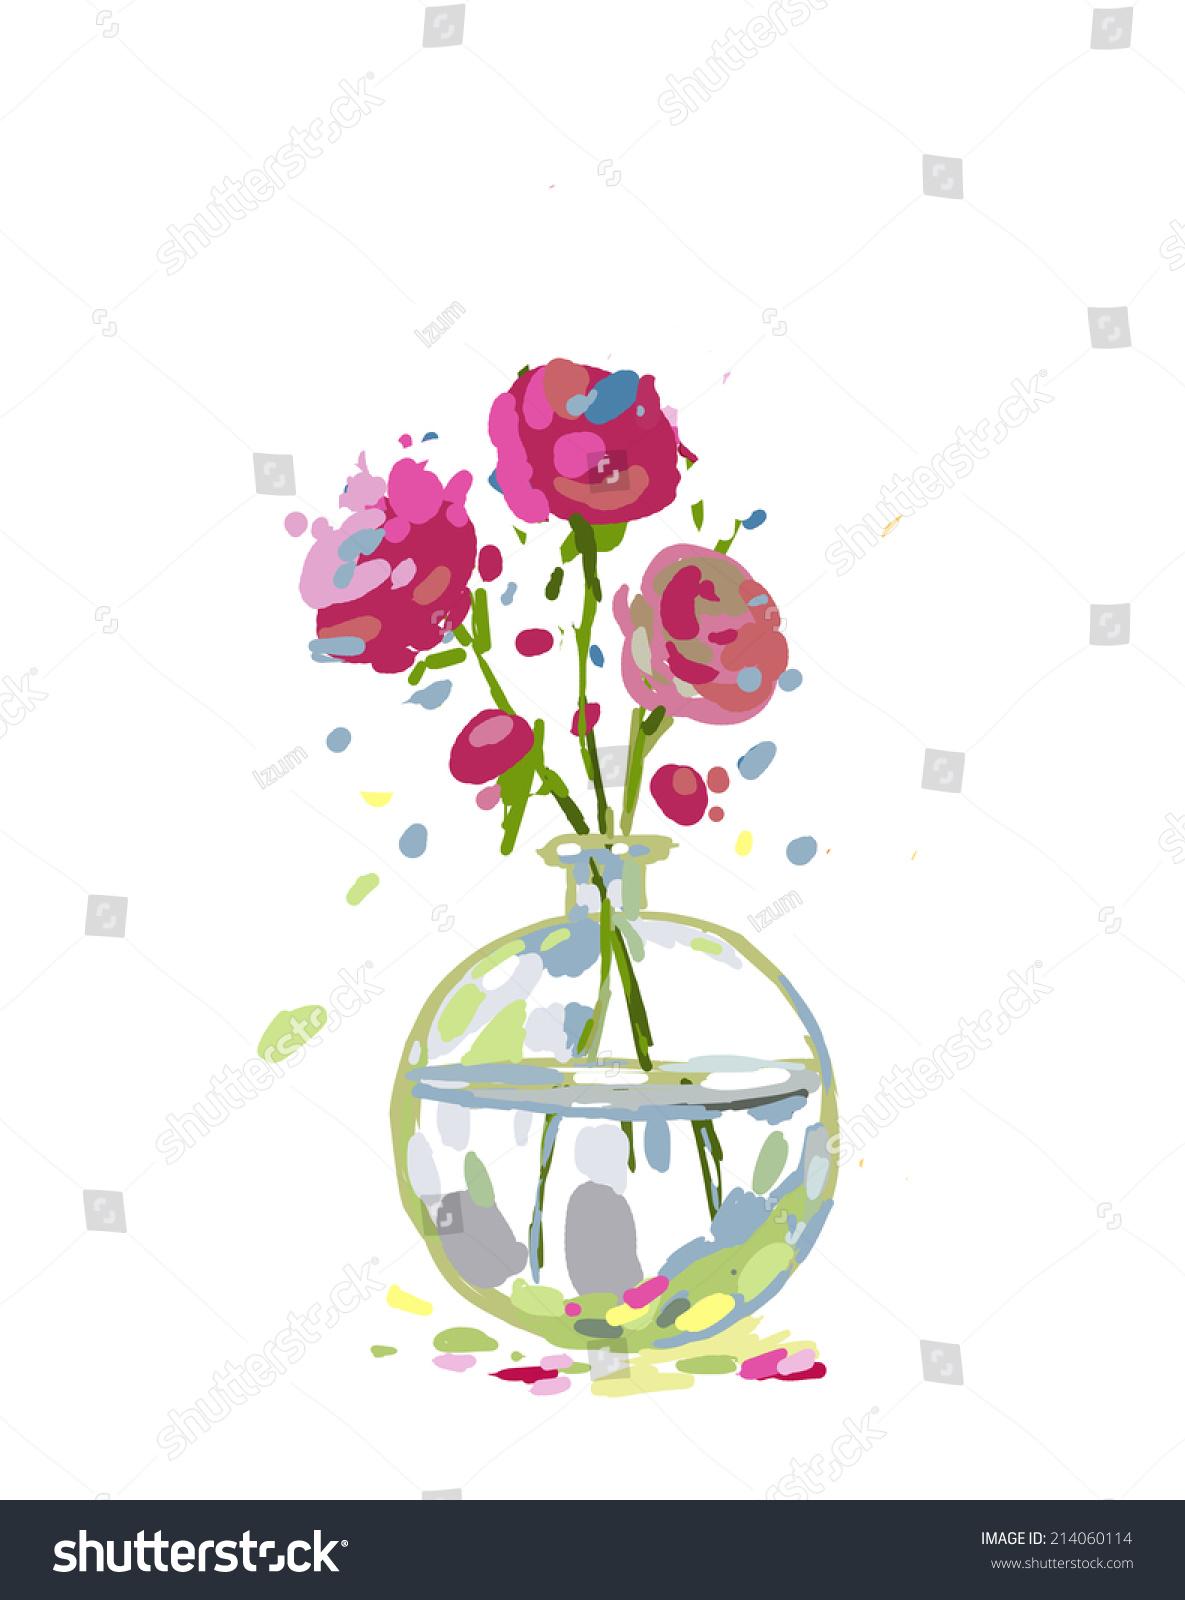 Illustration Pink Flowers Glass Vase Cartoon Stockillustration